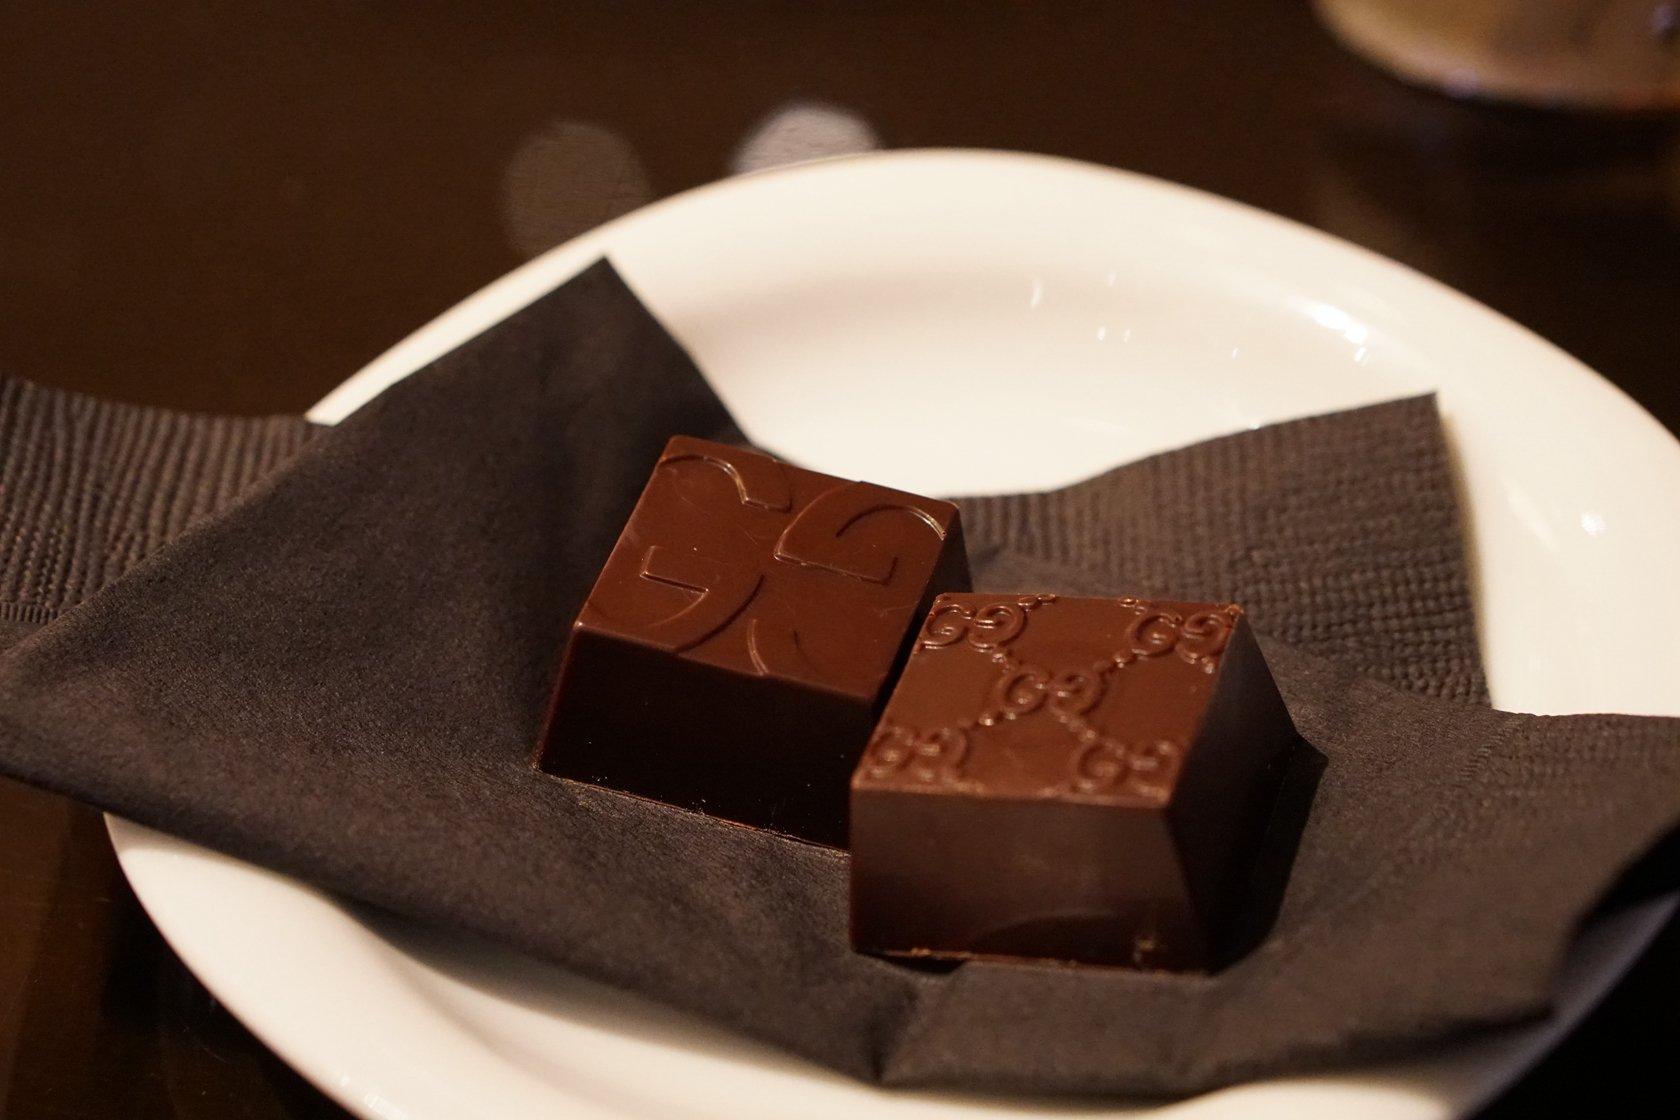 75c1e2fc9f94 所有食材都是从意大利进口的,提拉米苏是这里的招牌,巧克力上都有GUCCI 的logo。12月东京的天气真是让我意想不到的温暖,点了杯冰卡布奇诺,味道不错,巧克力有4种,很 ...